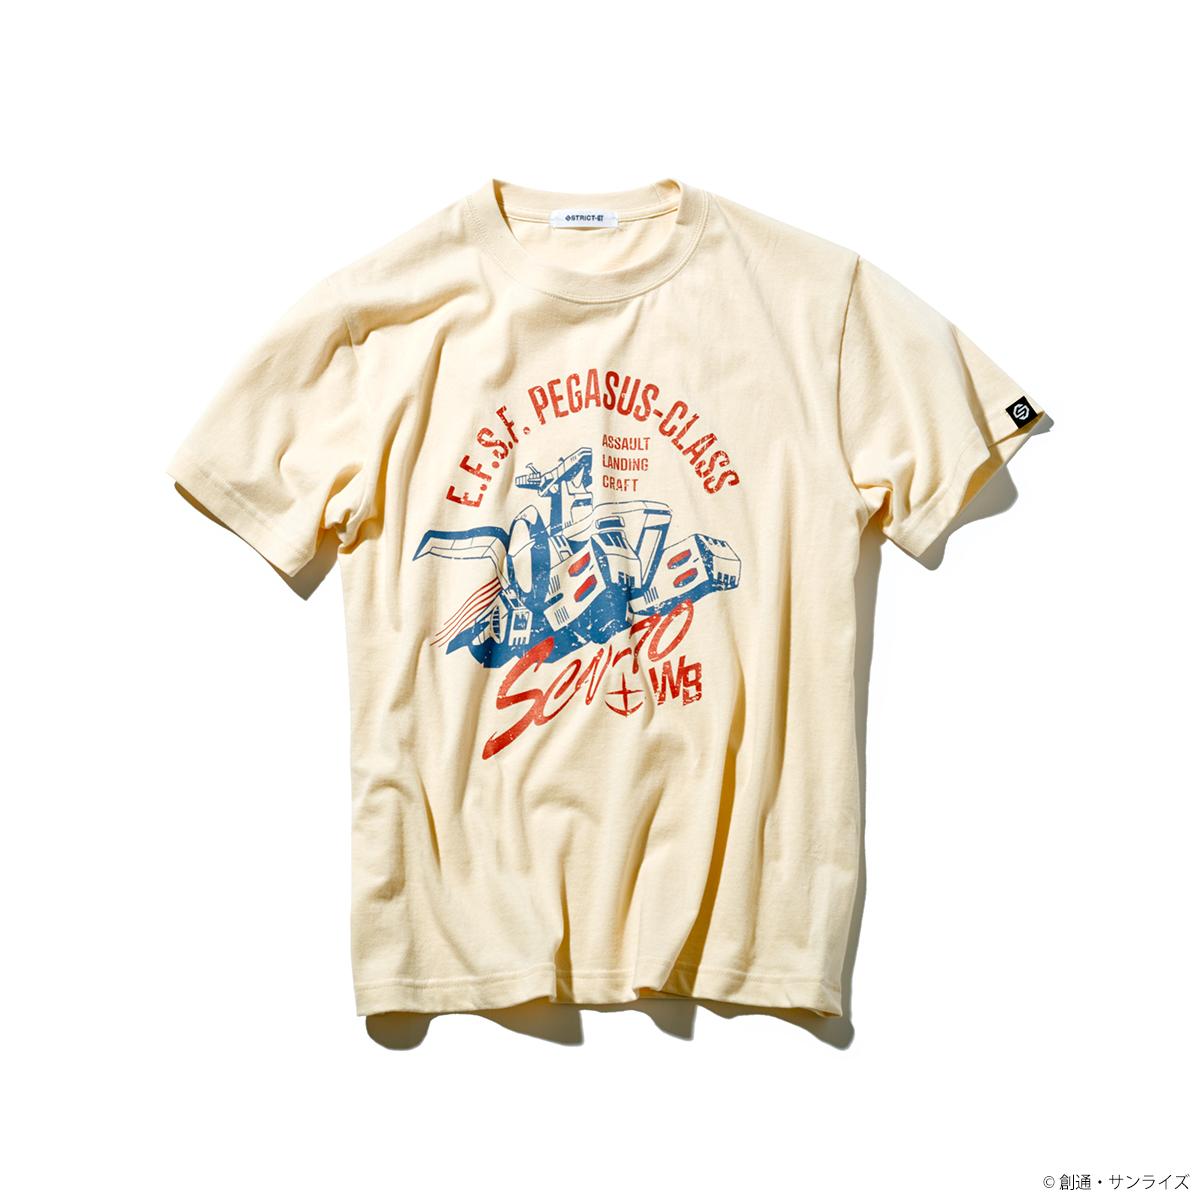 STRICT-G『機動戦士ガンダム』 親子Tシャツ ホワイトベース柄